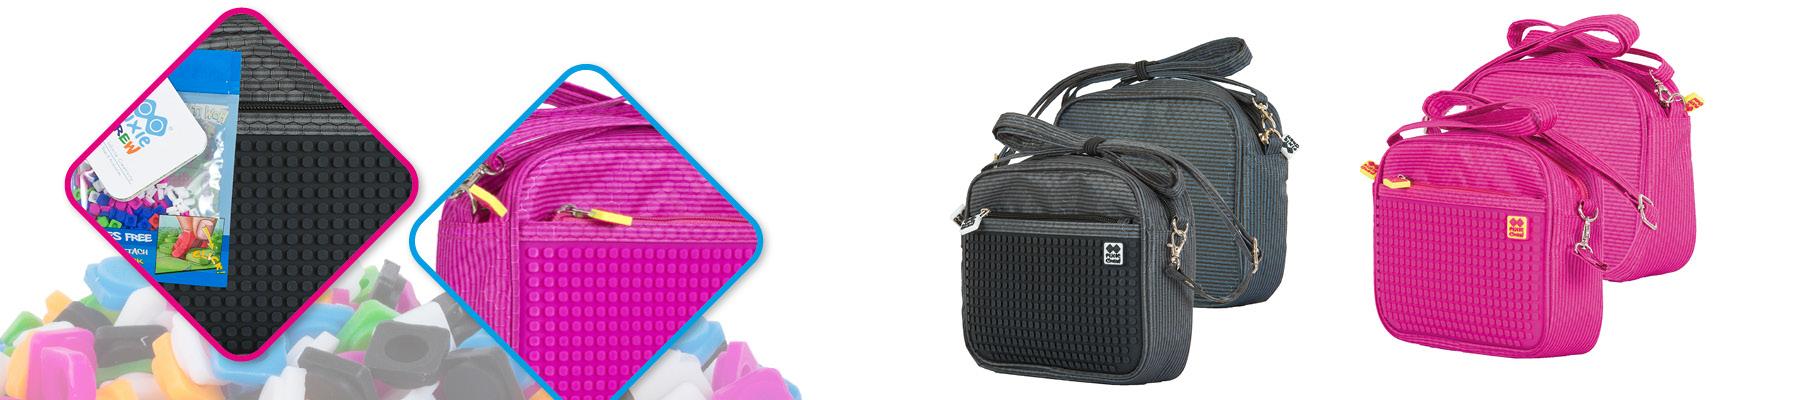 Pixie Crew - Pixie Handtasche